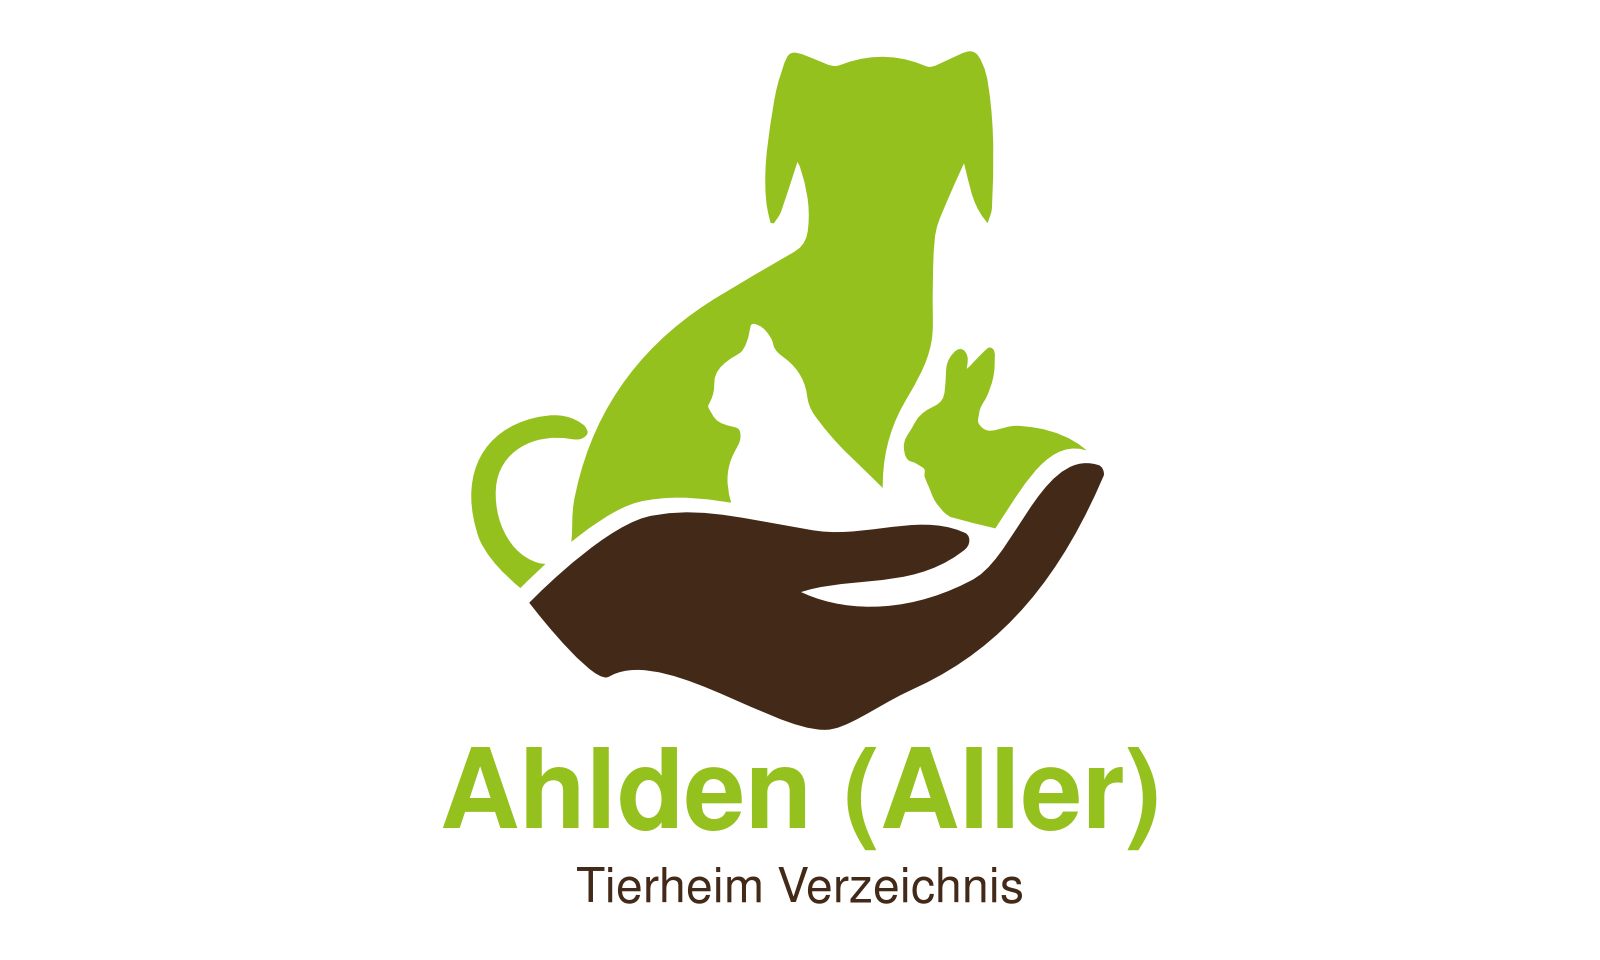 Tierheim Ahlden (Aller)